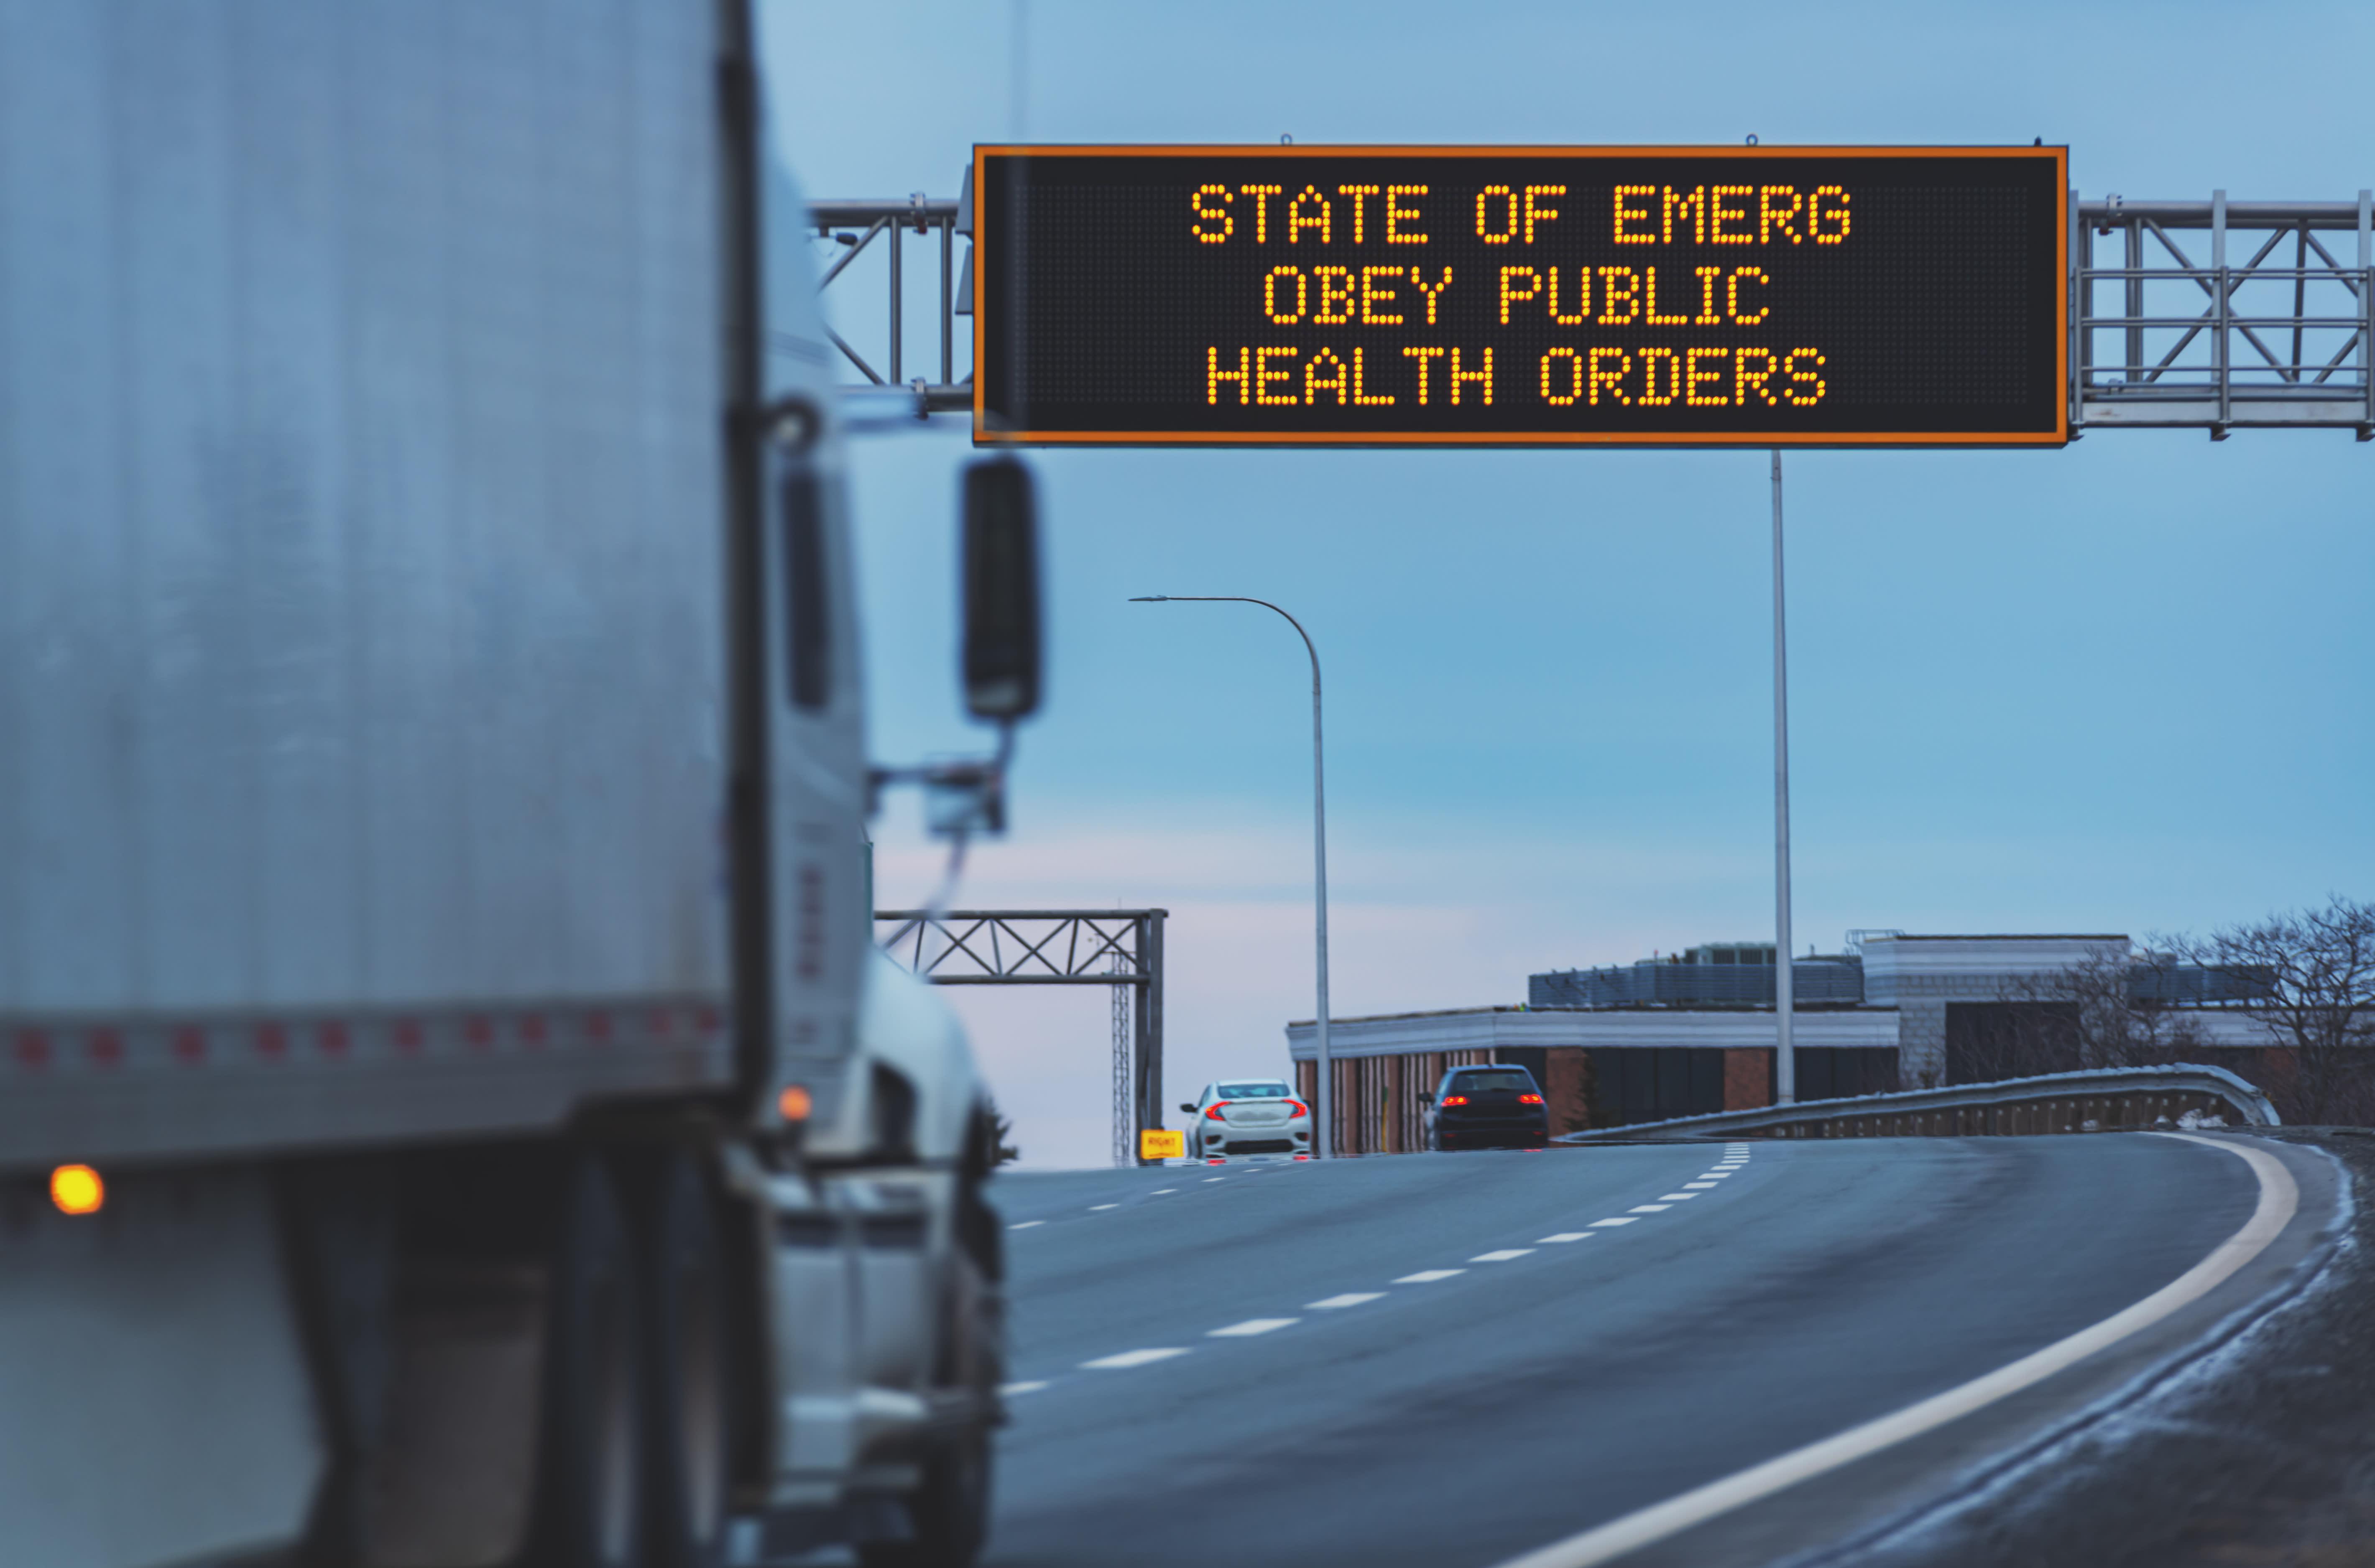 Veteran trucker describes 'chaos' after coronavirus